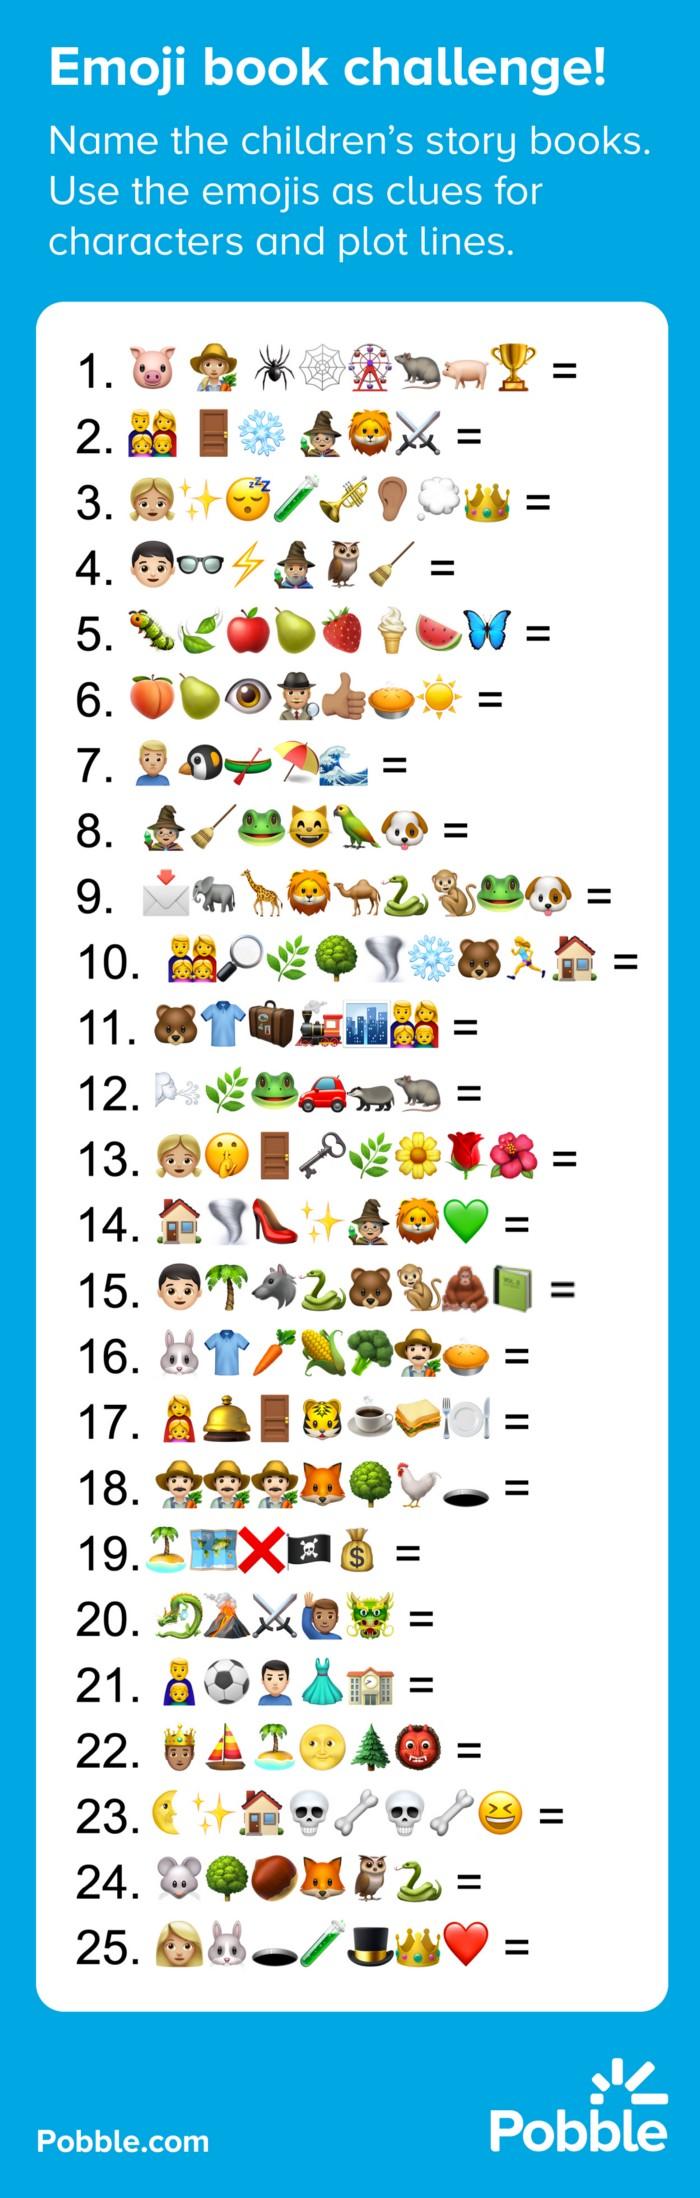 Pobble Emojis